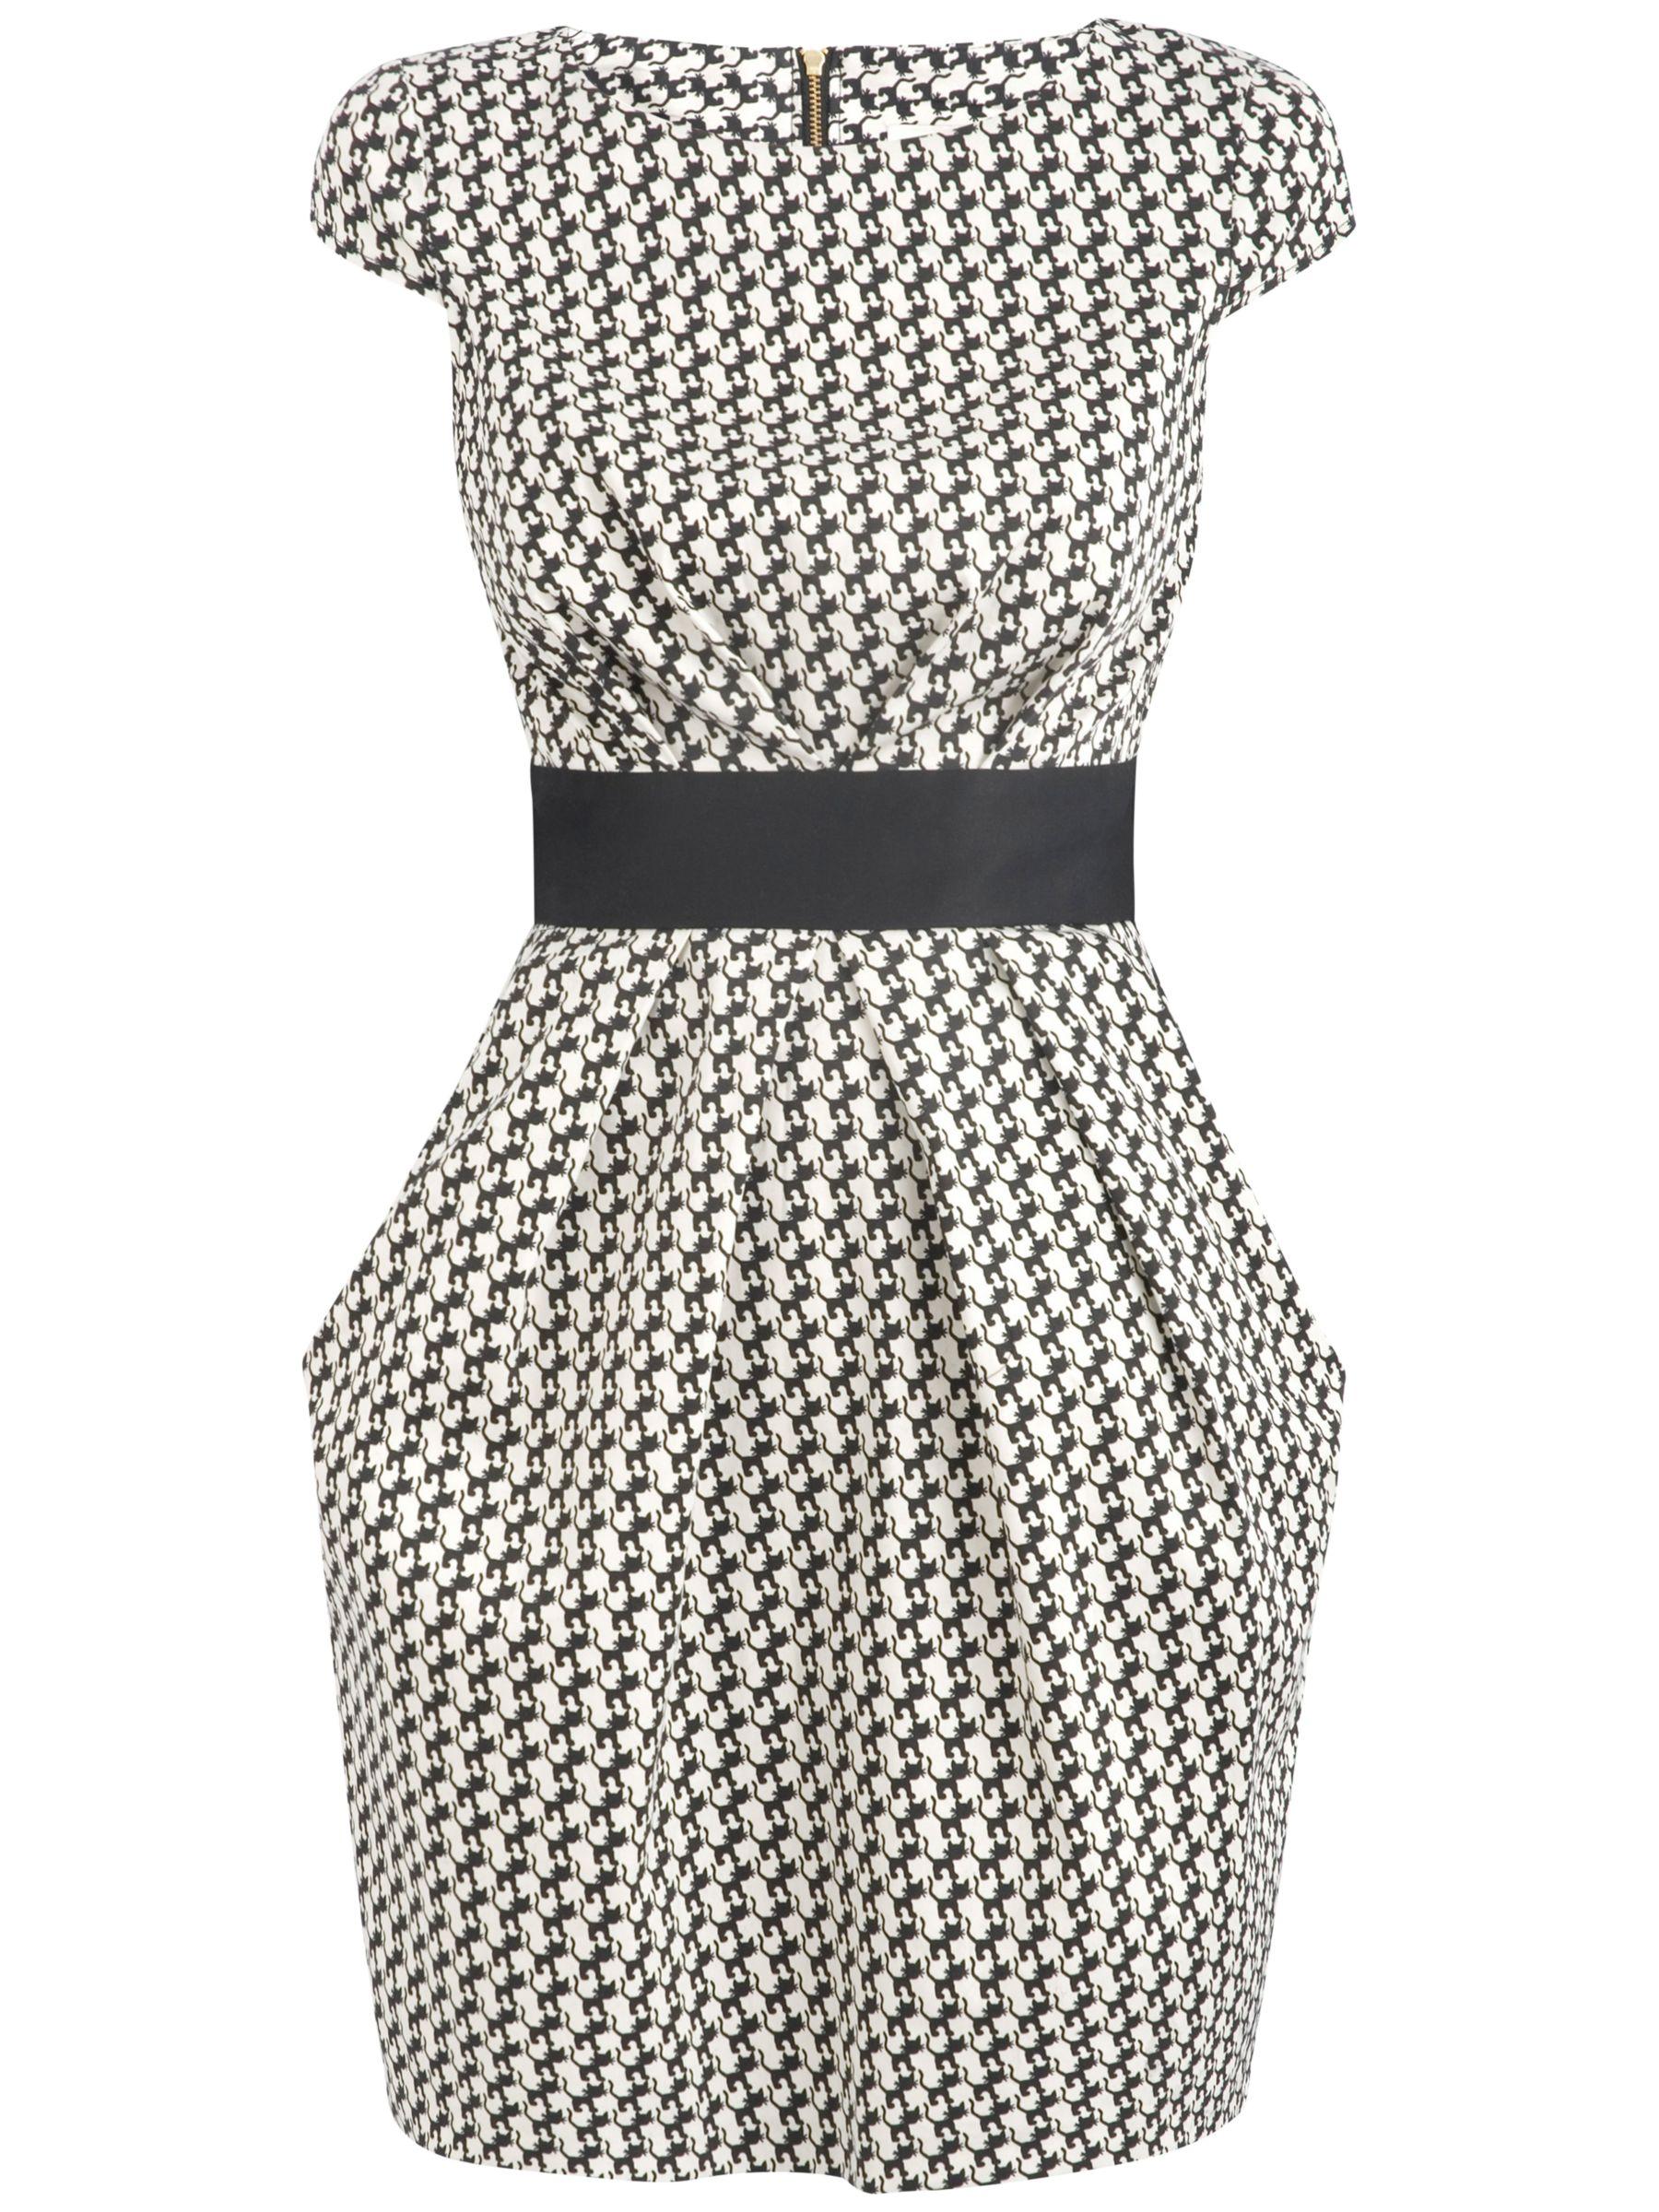 almari contrast waist dress black/white, almari, contrast, waist, dress, black/white, 8 14 10, women, womens dresses, special offers, womenswear offers, womens dresses offers, 931219